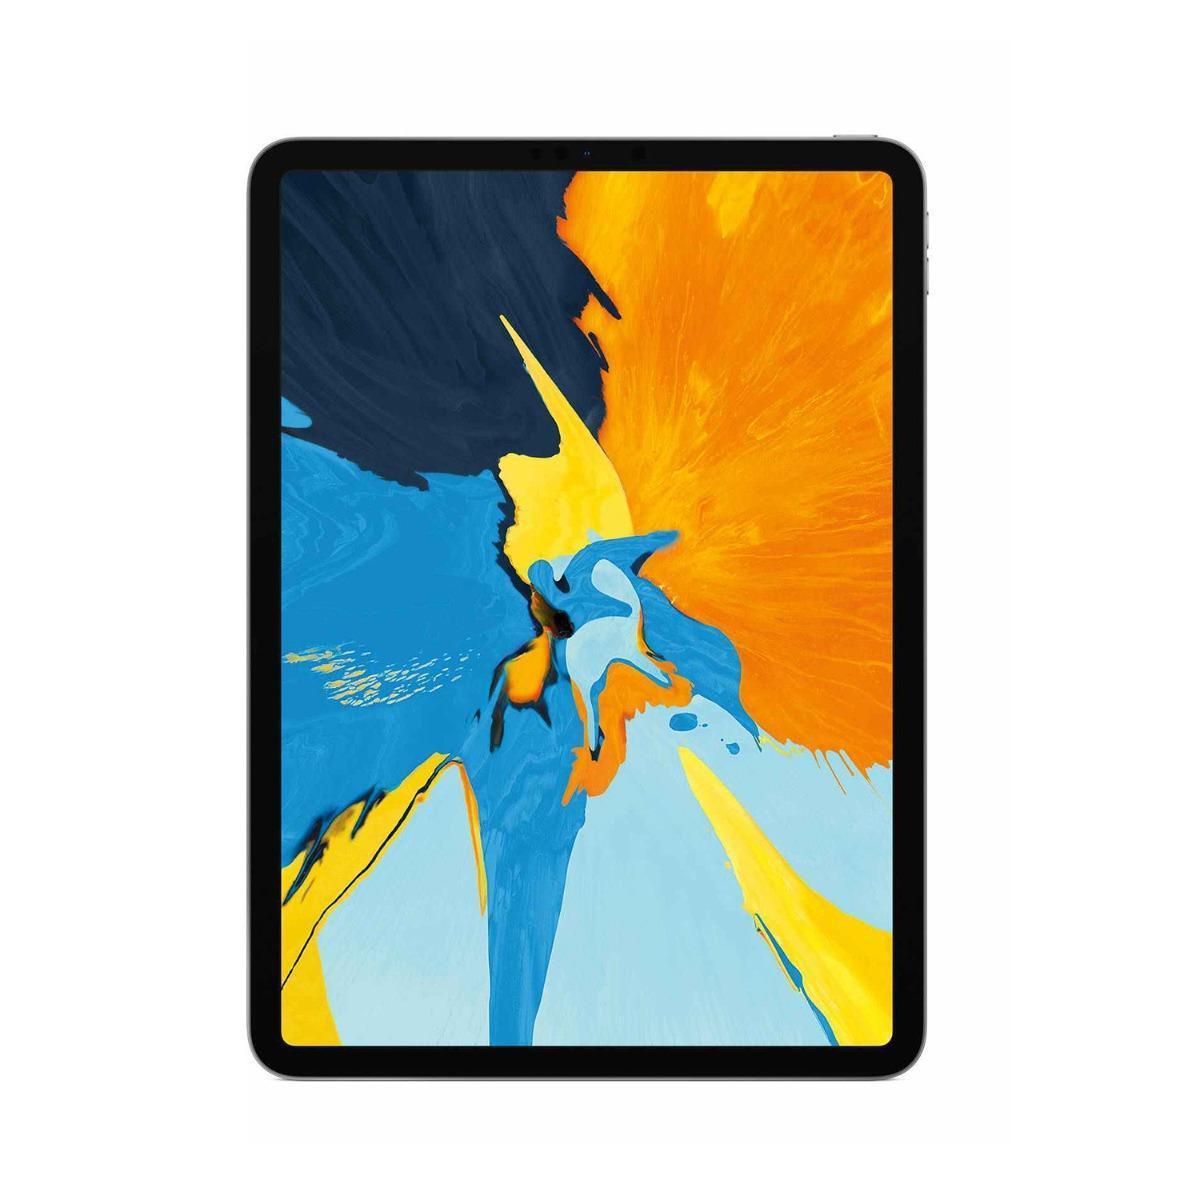 "iPad Pro 11"" (2018) - WiFi + 4G"